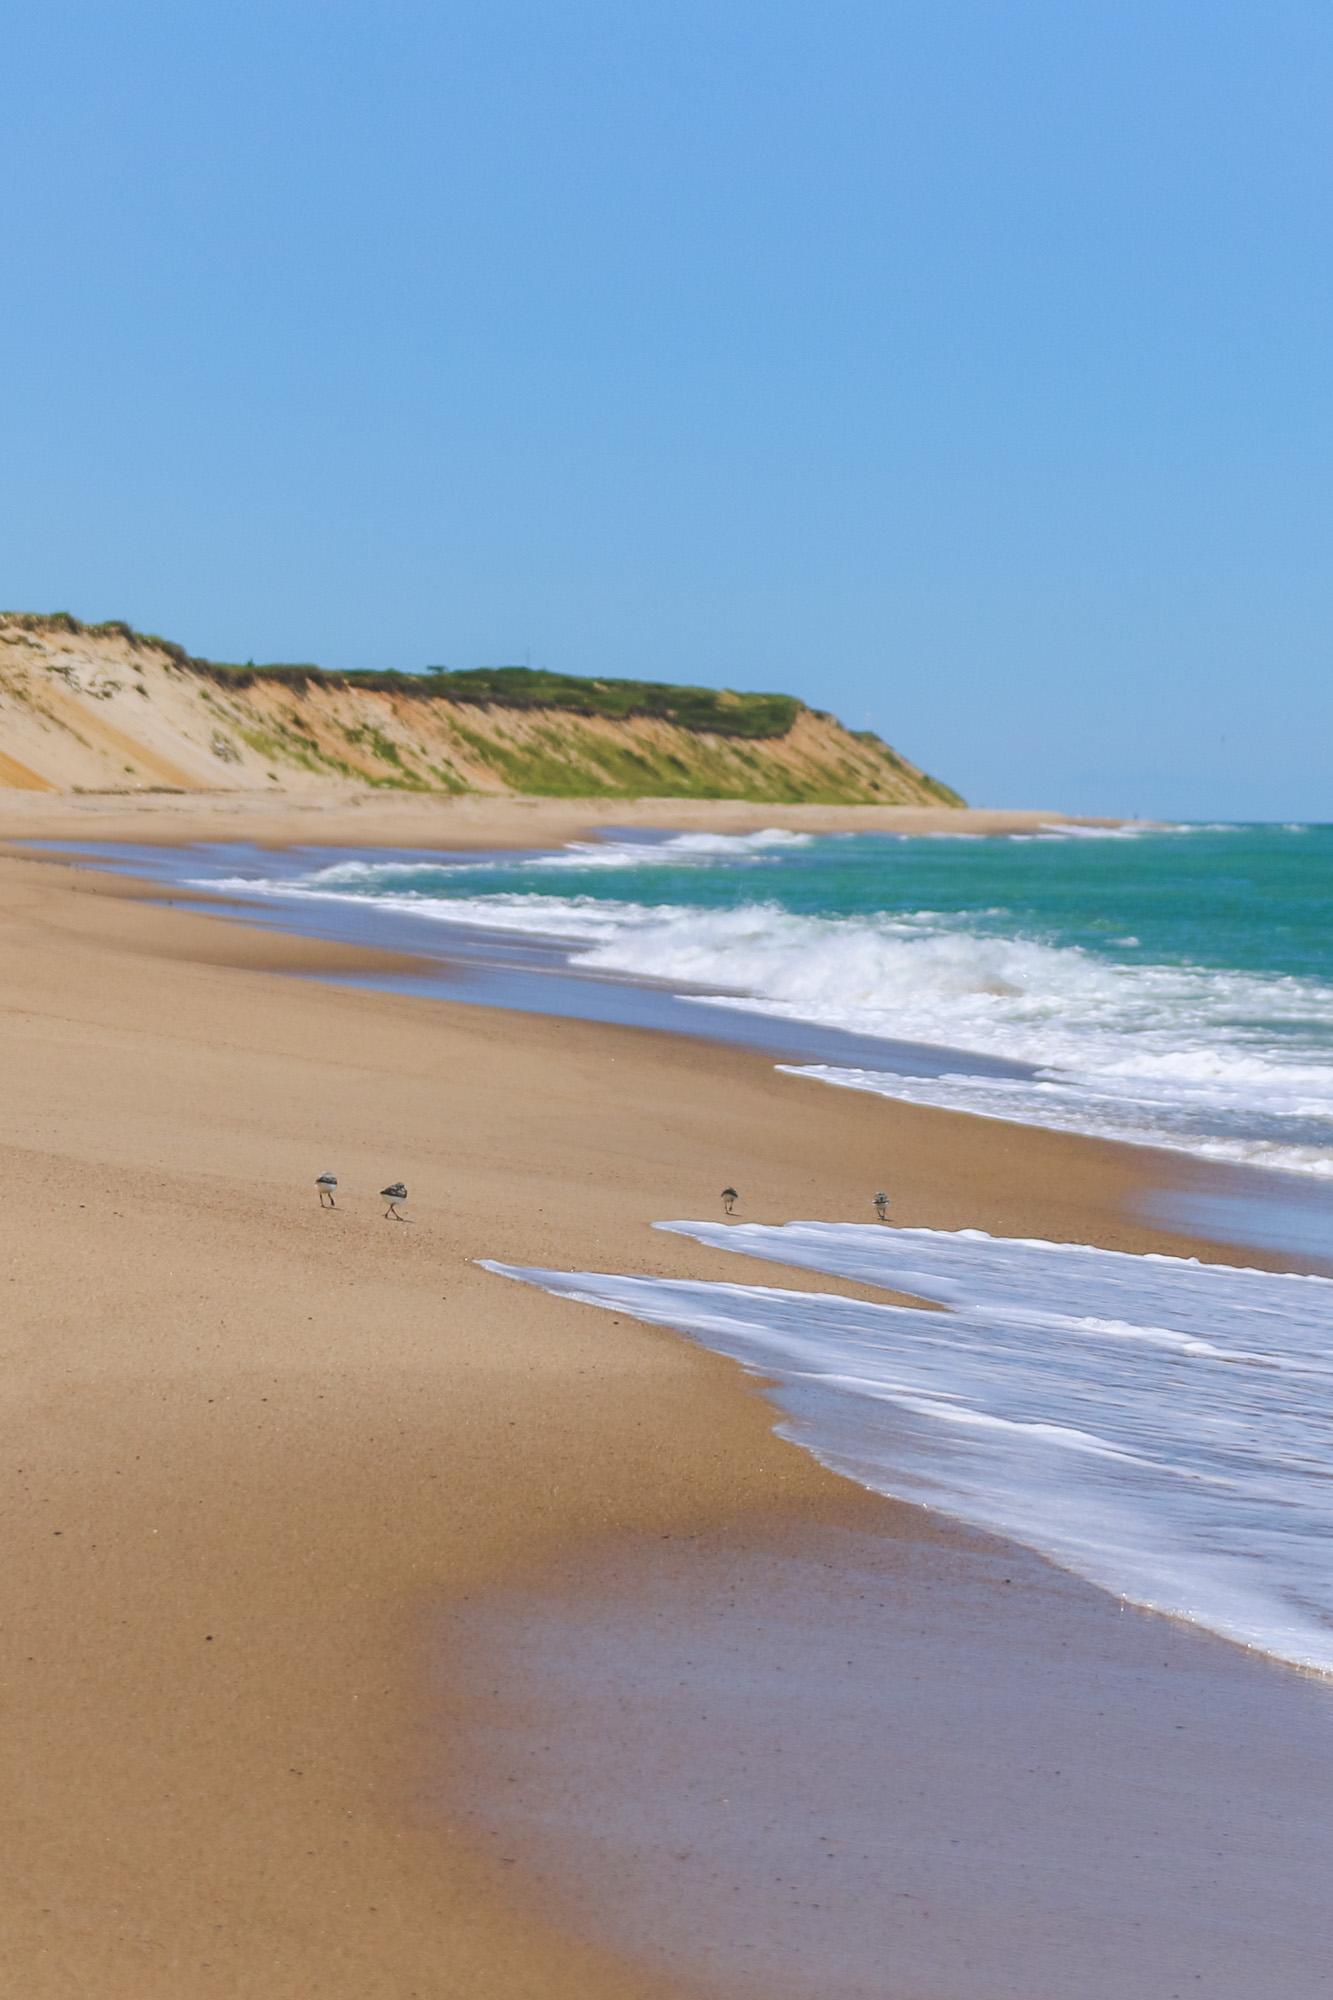 Socially Distanced Beach Day Essentials